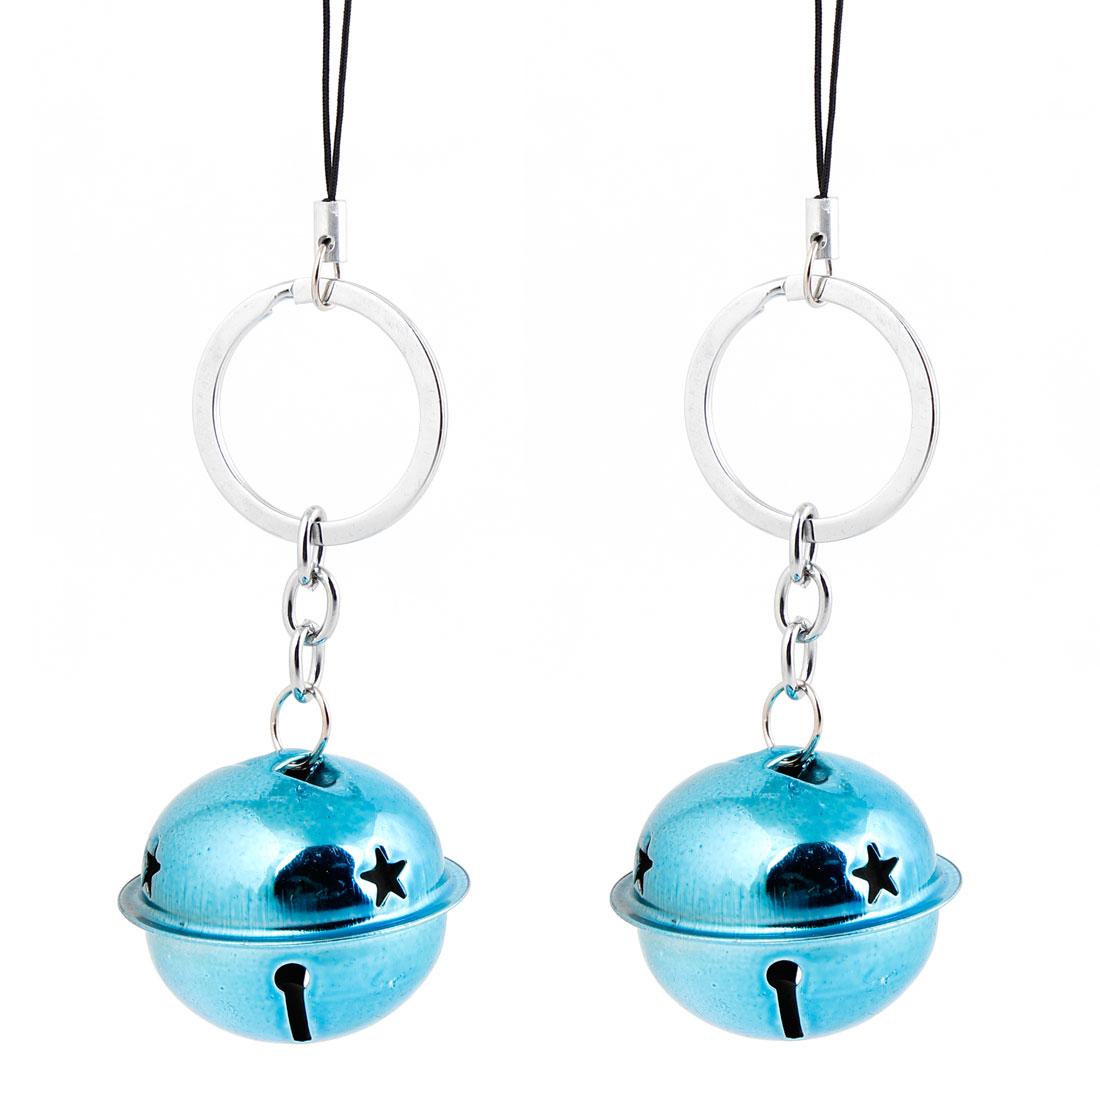 Metal Blue Small Bell Dangling Pendant Key Ring Hanging Ornament Pair